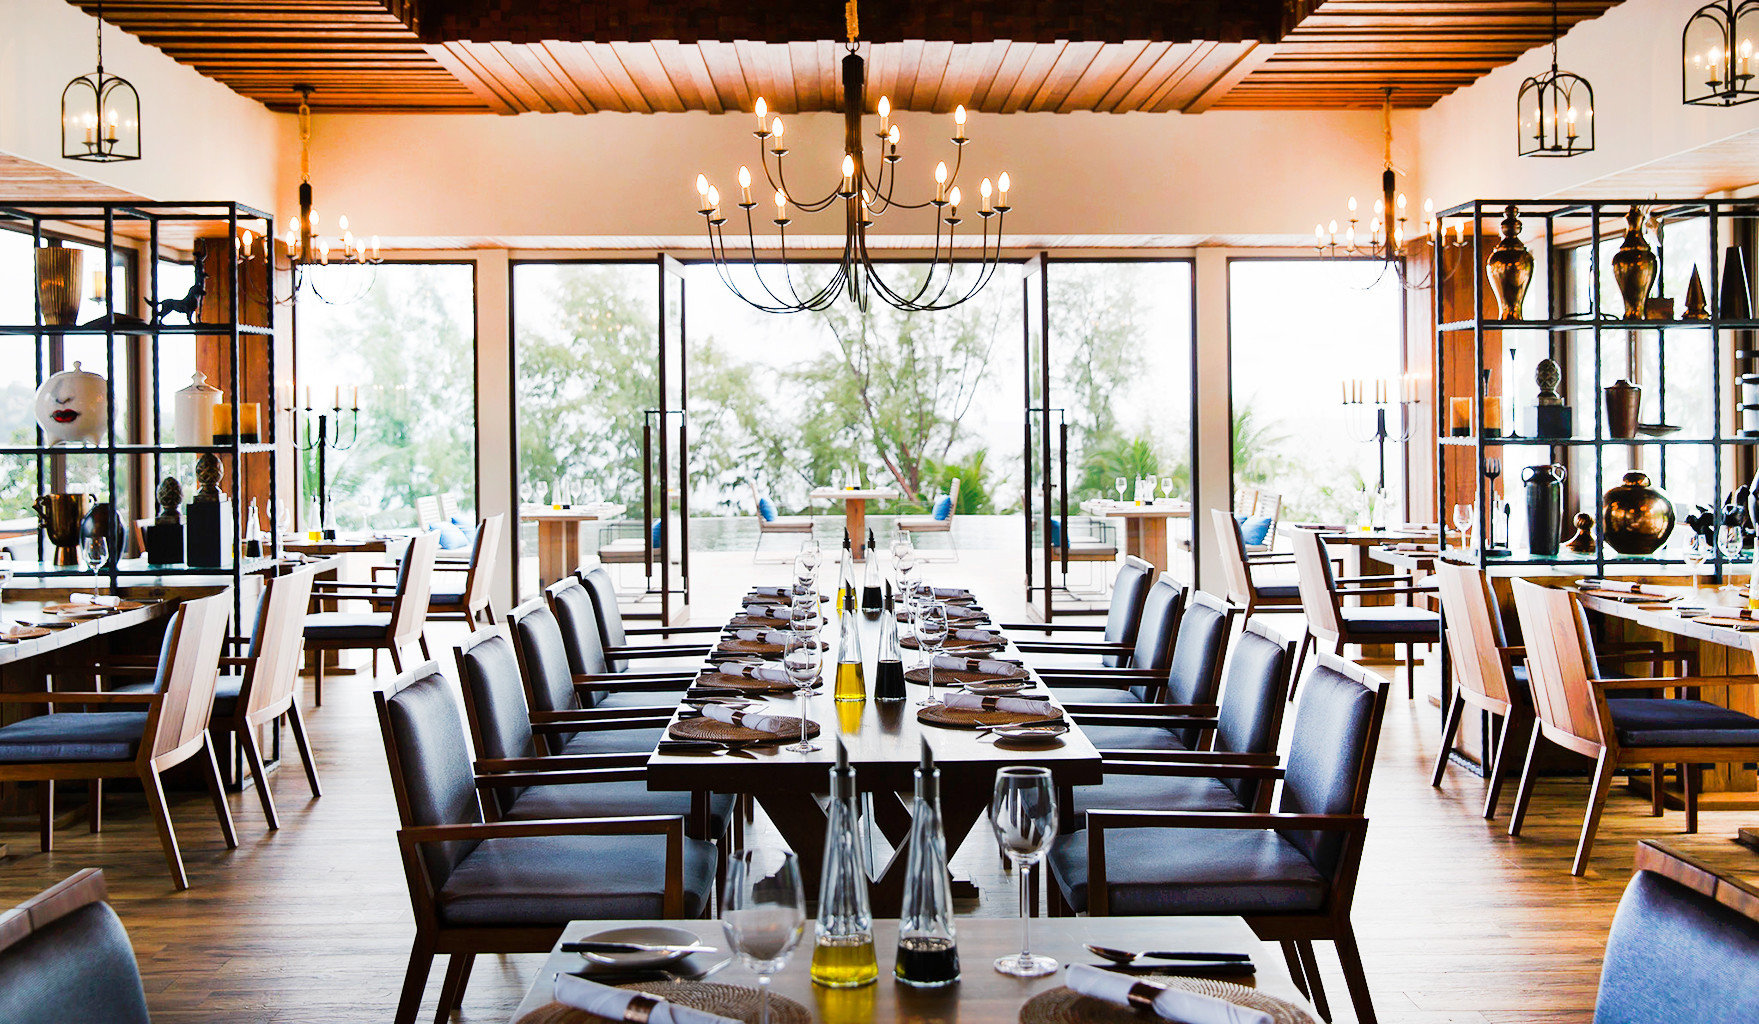 Beach Dining Family Modern Resort chair restaurant wooden home set dining table